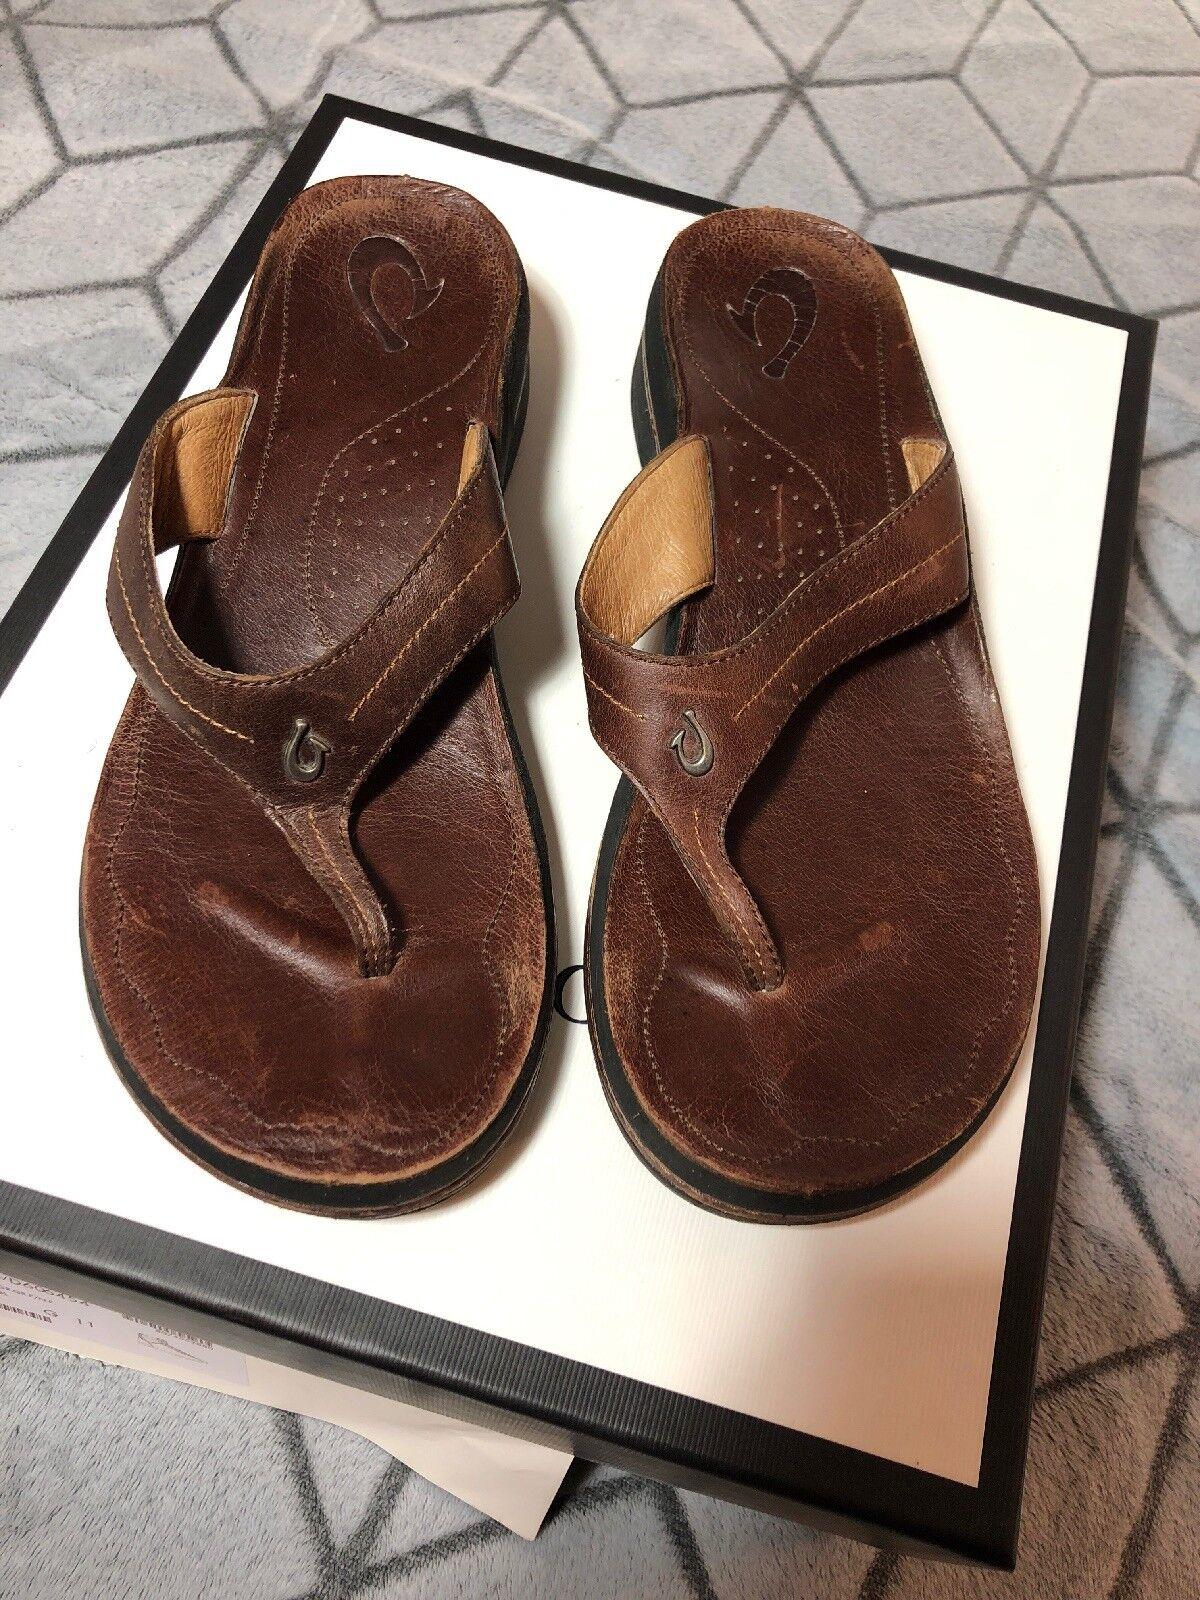 B40 Women's Olukai LANI Leather Flip Flop Sandals Size 10 Brown